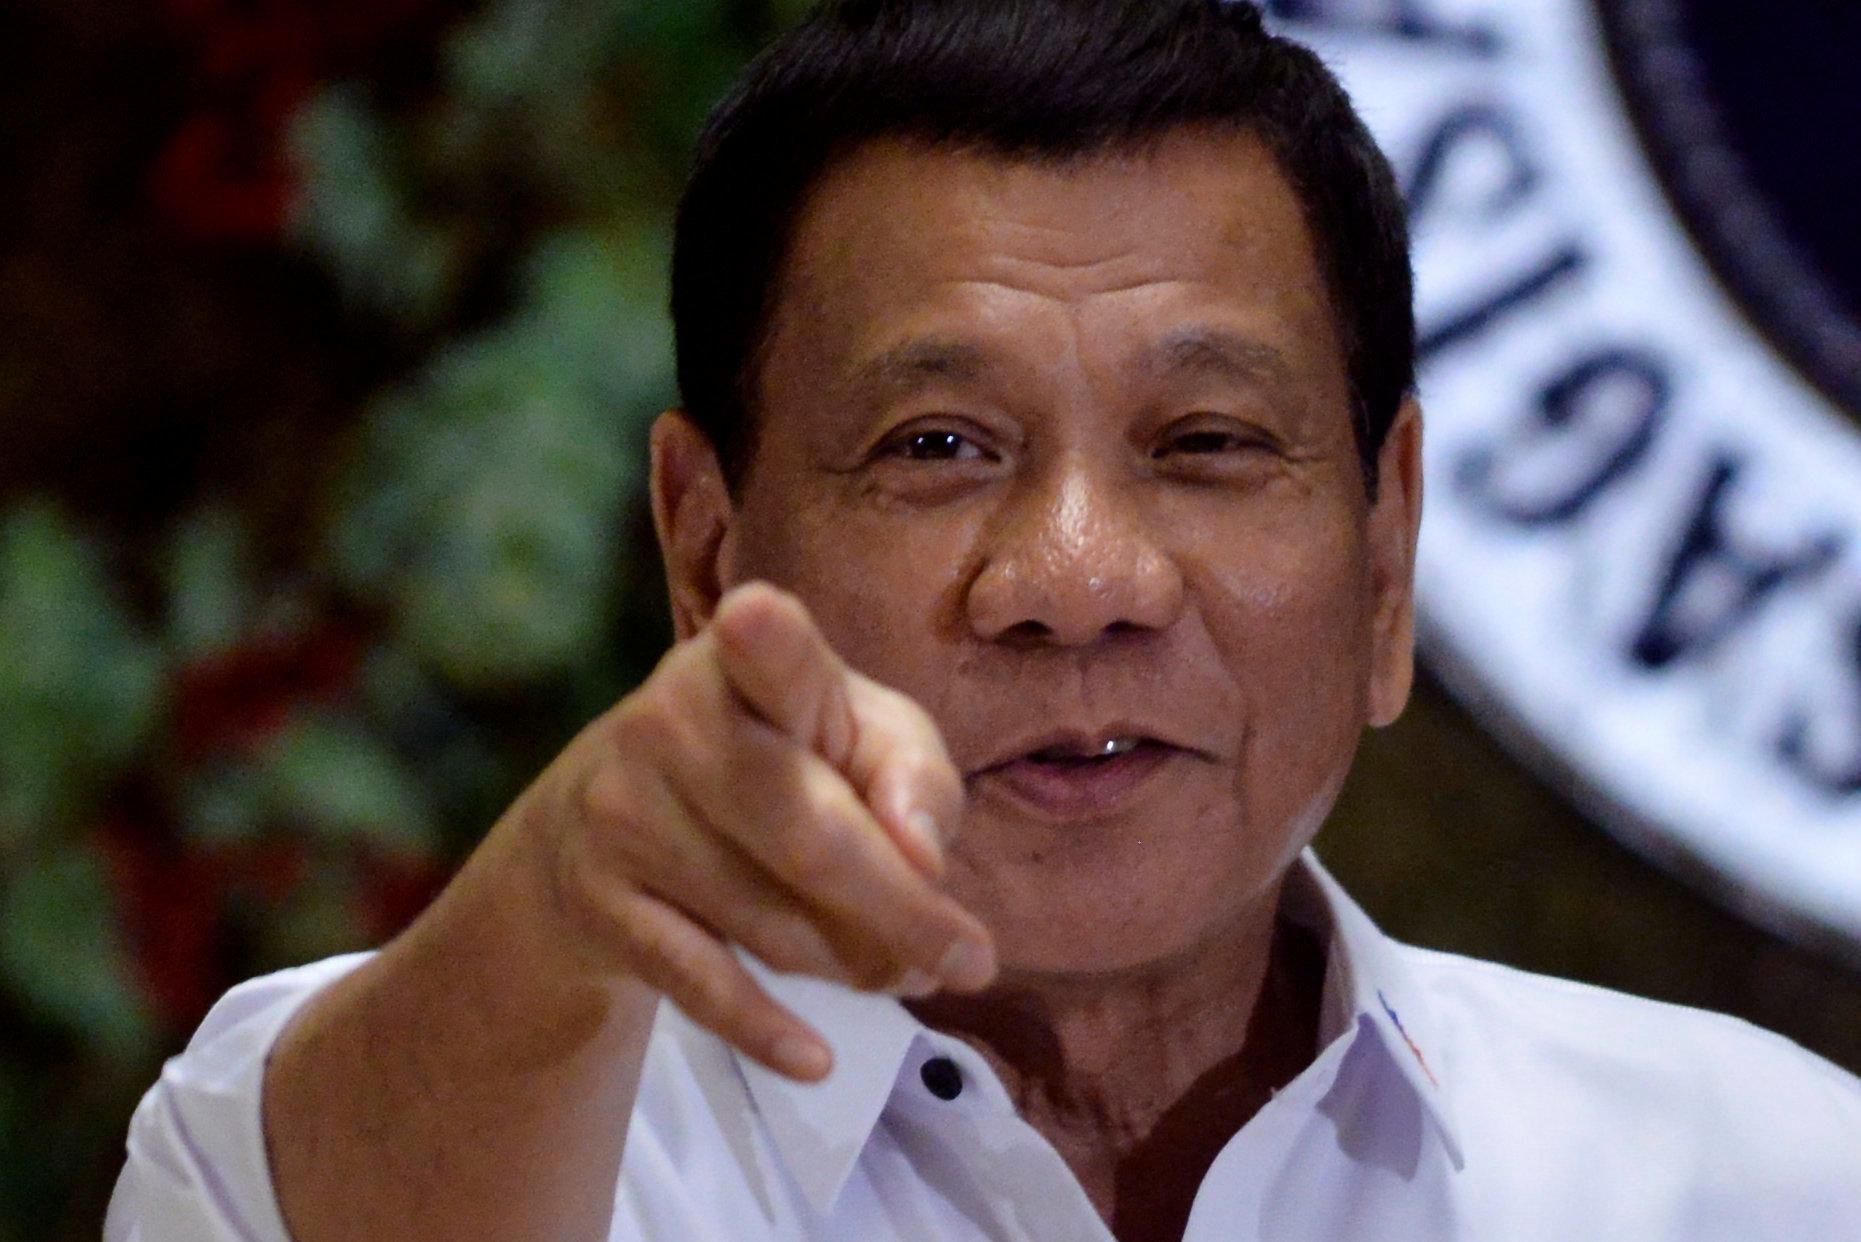 Philippine President Rodrigo Duterteclaimedhe once hurled a man suspected of rape and murder...